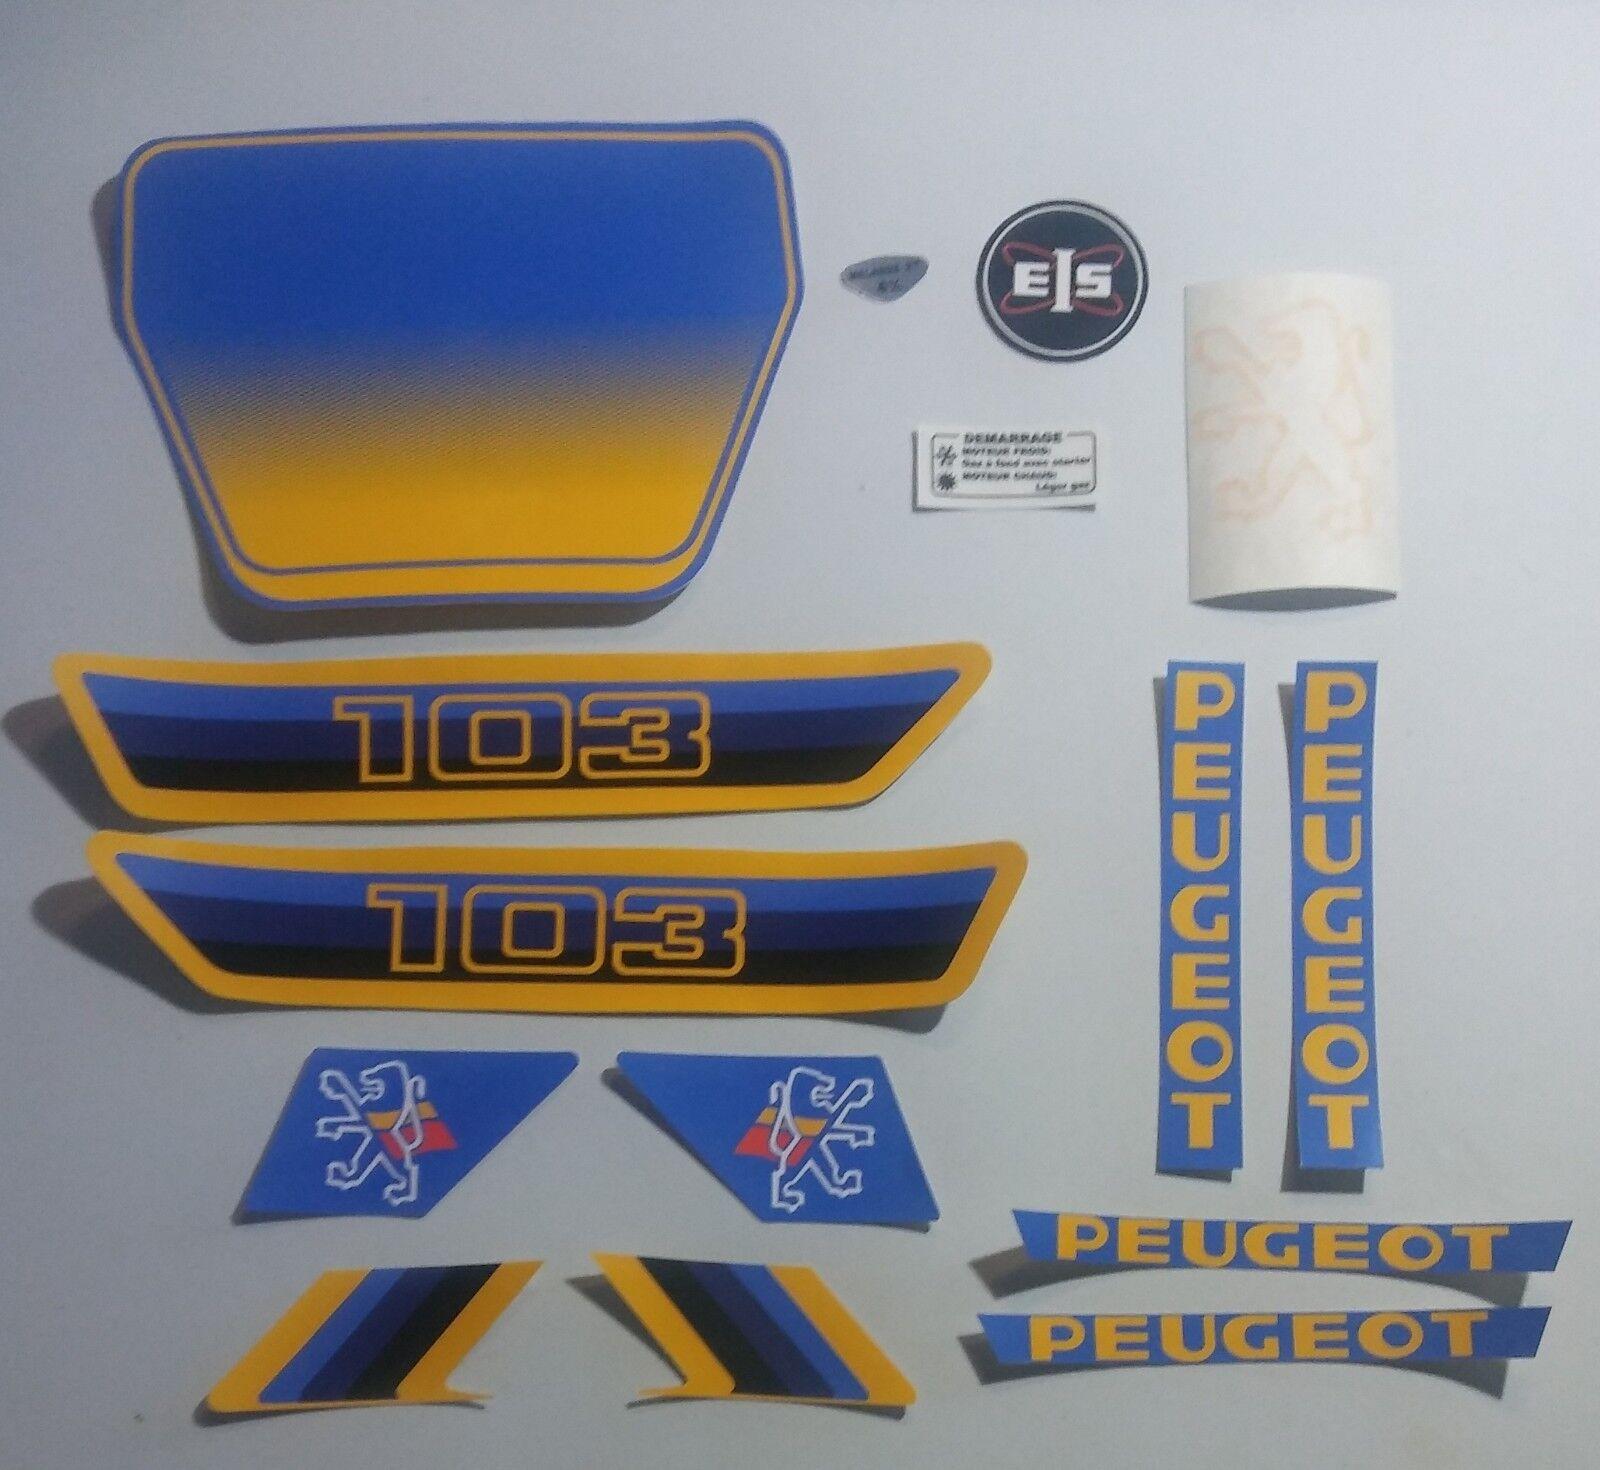 Autocollant Peugeot 103 Bleu/Jaune.